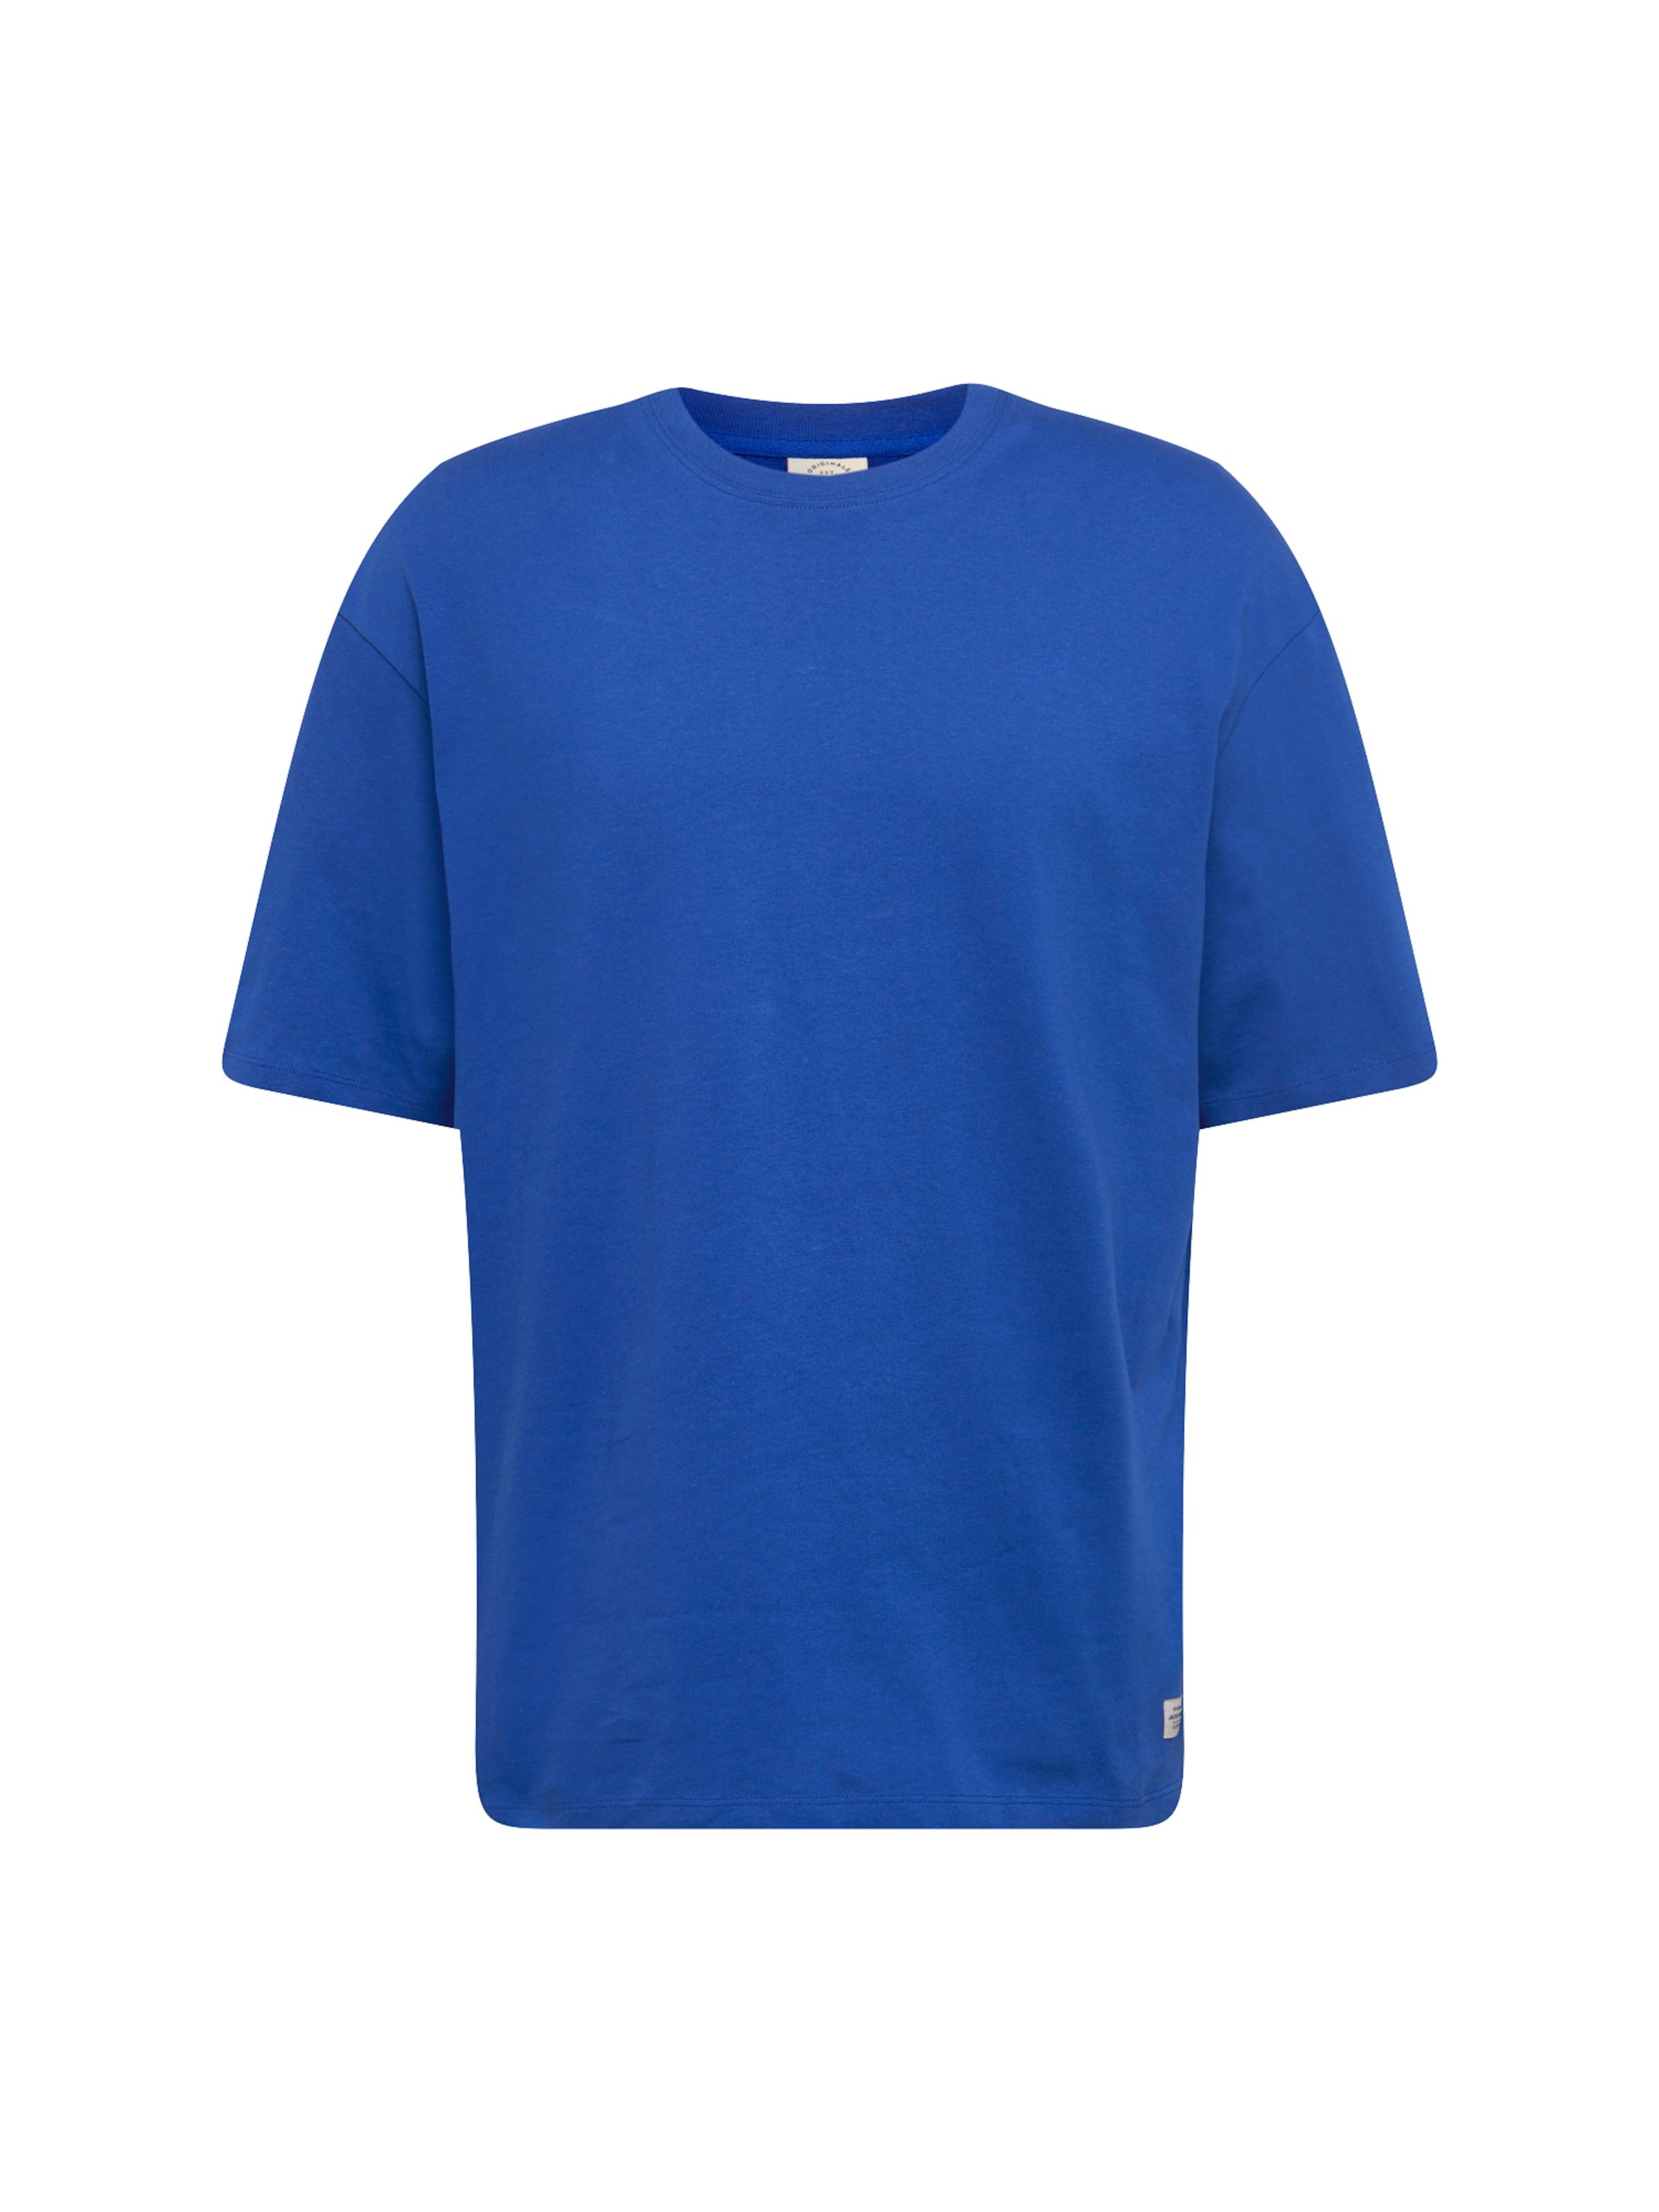 Shirt In Jackamp; Jones 'jorskyler' Royalblau LpqUzVSGM